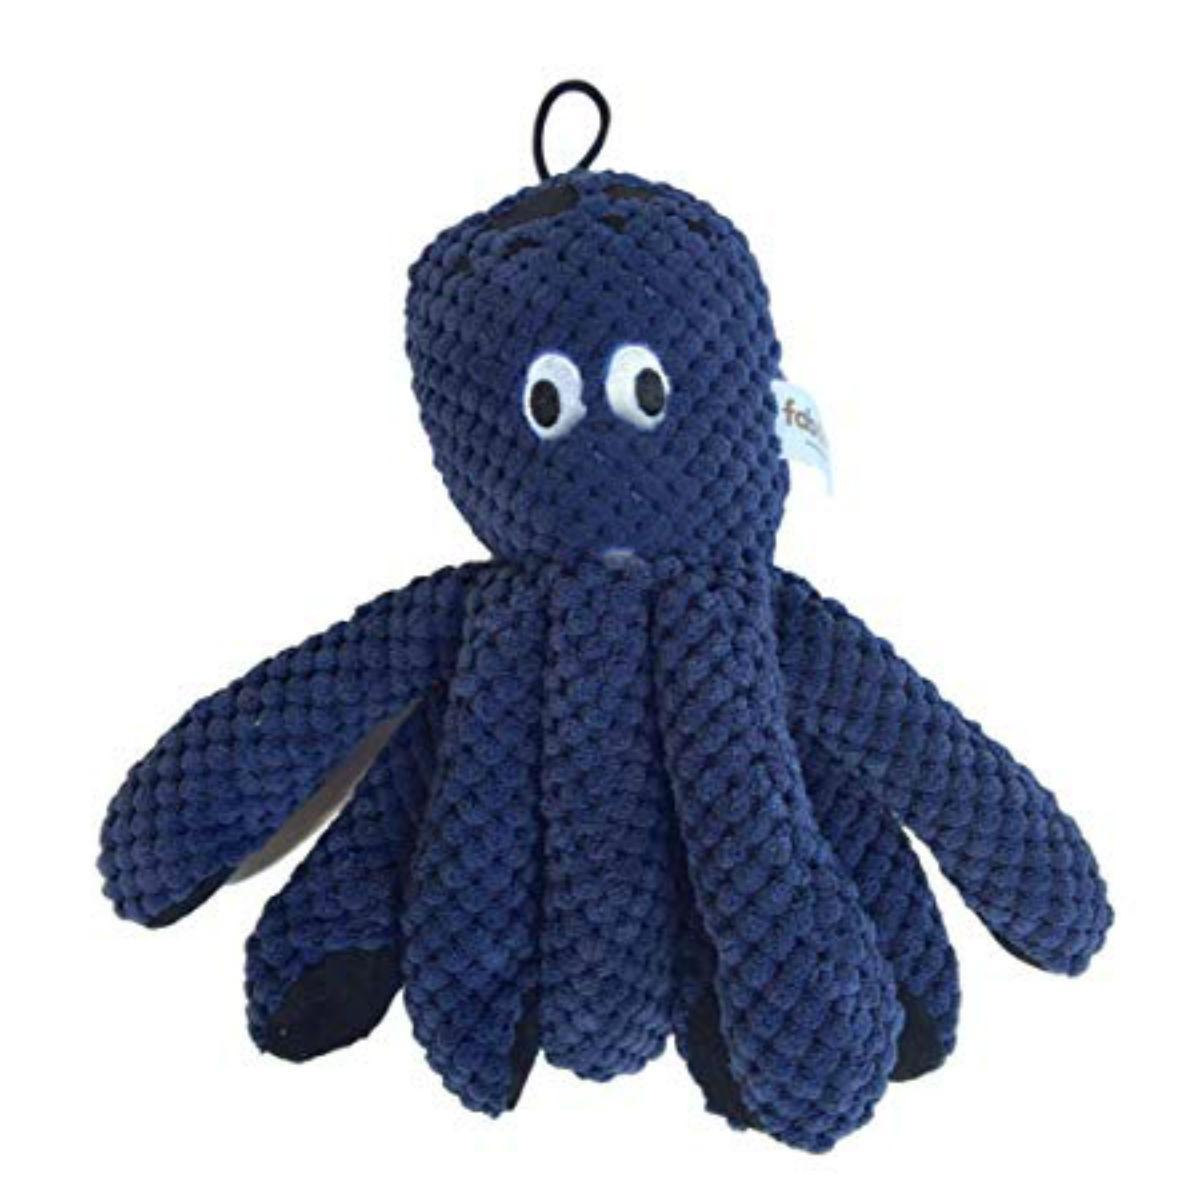 fabdog® Floppy Friends Dog Toy - Navy Octopus